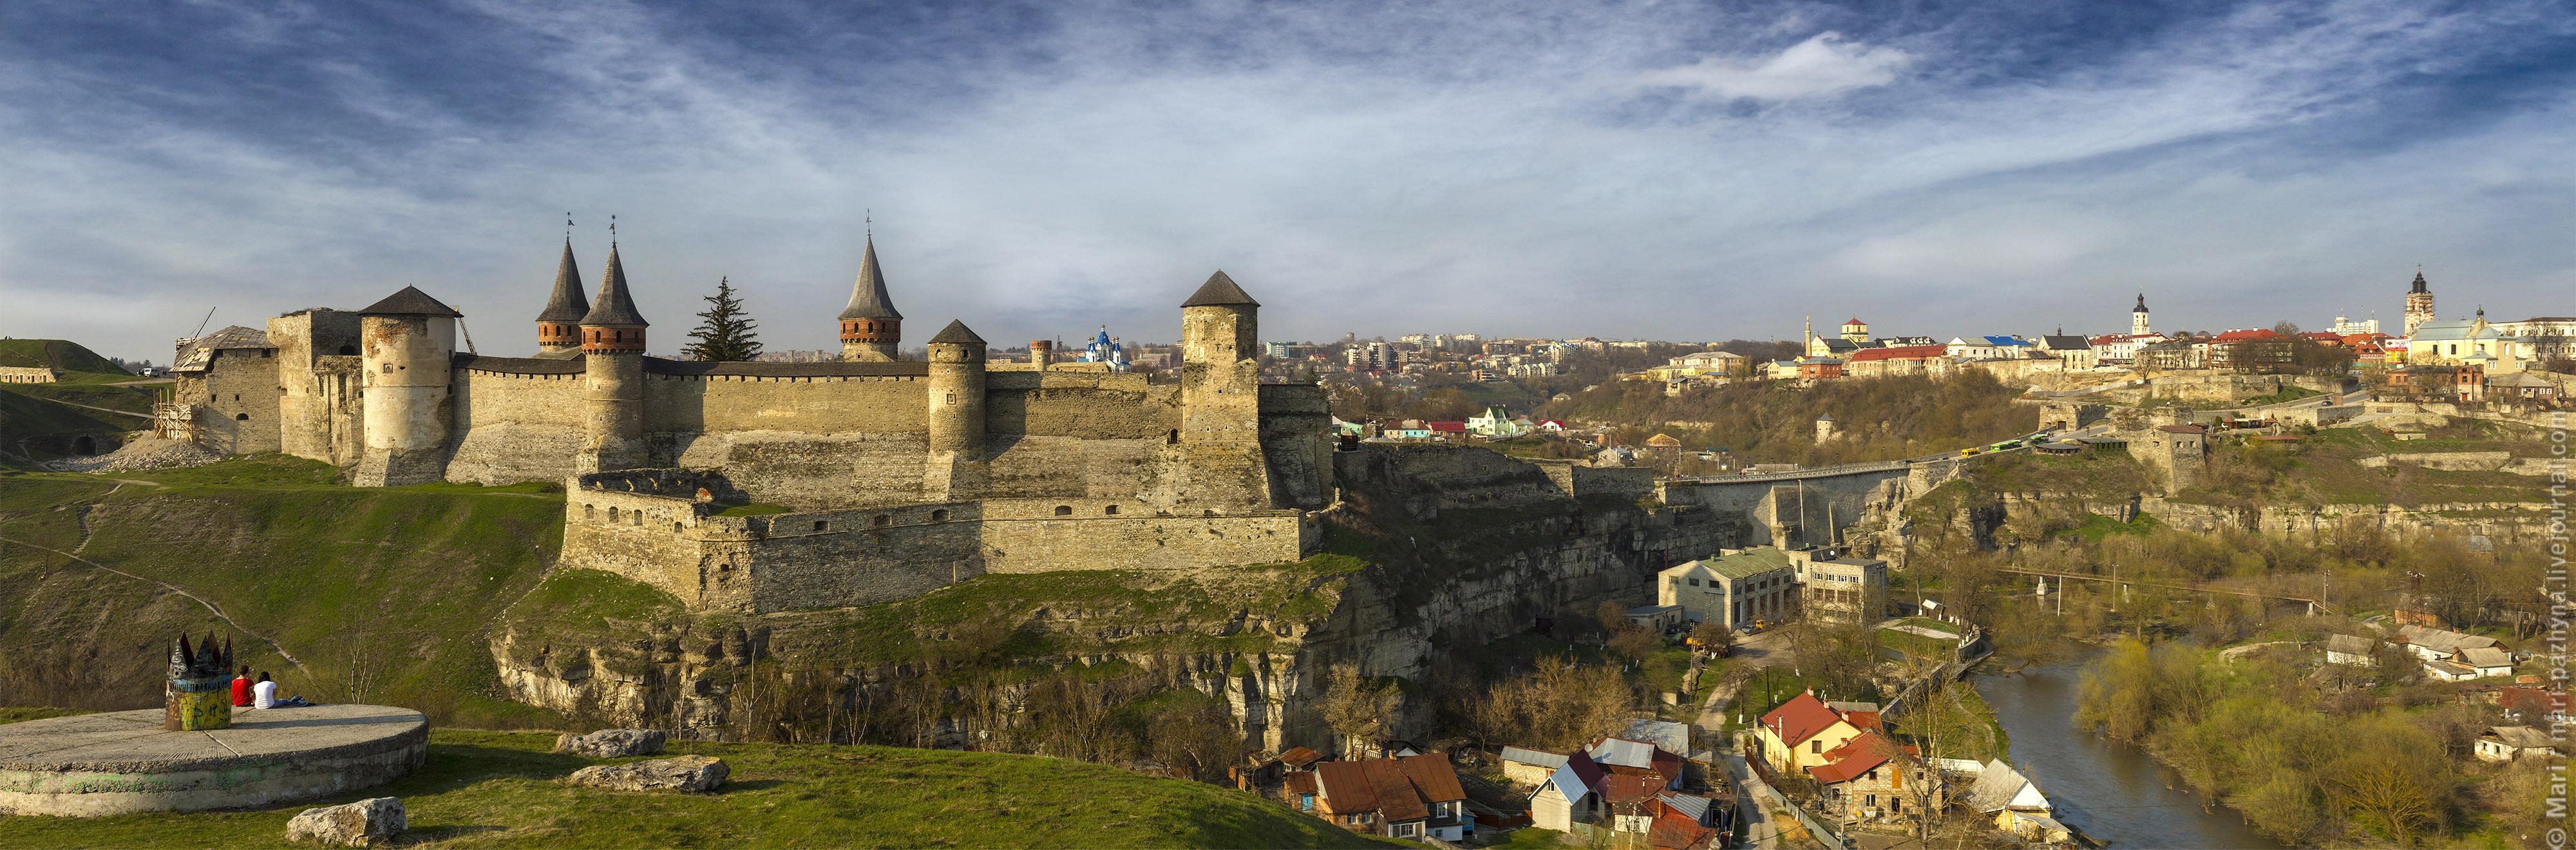 Image result for каменец подольский старый город